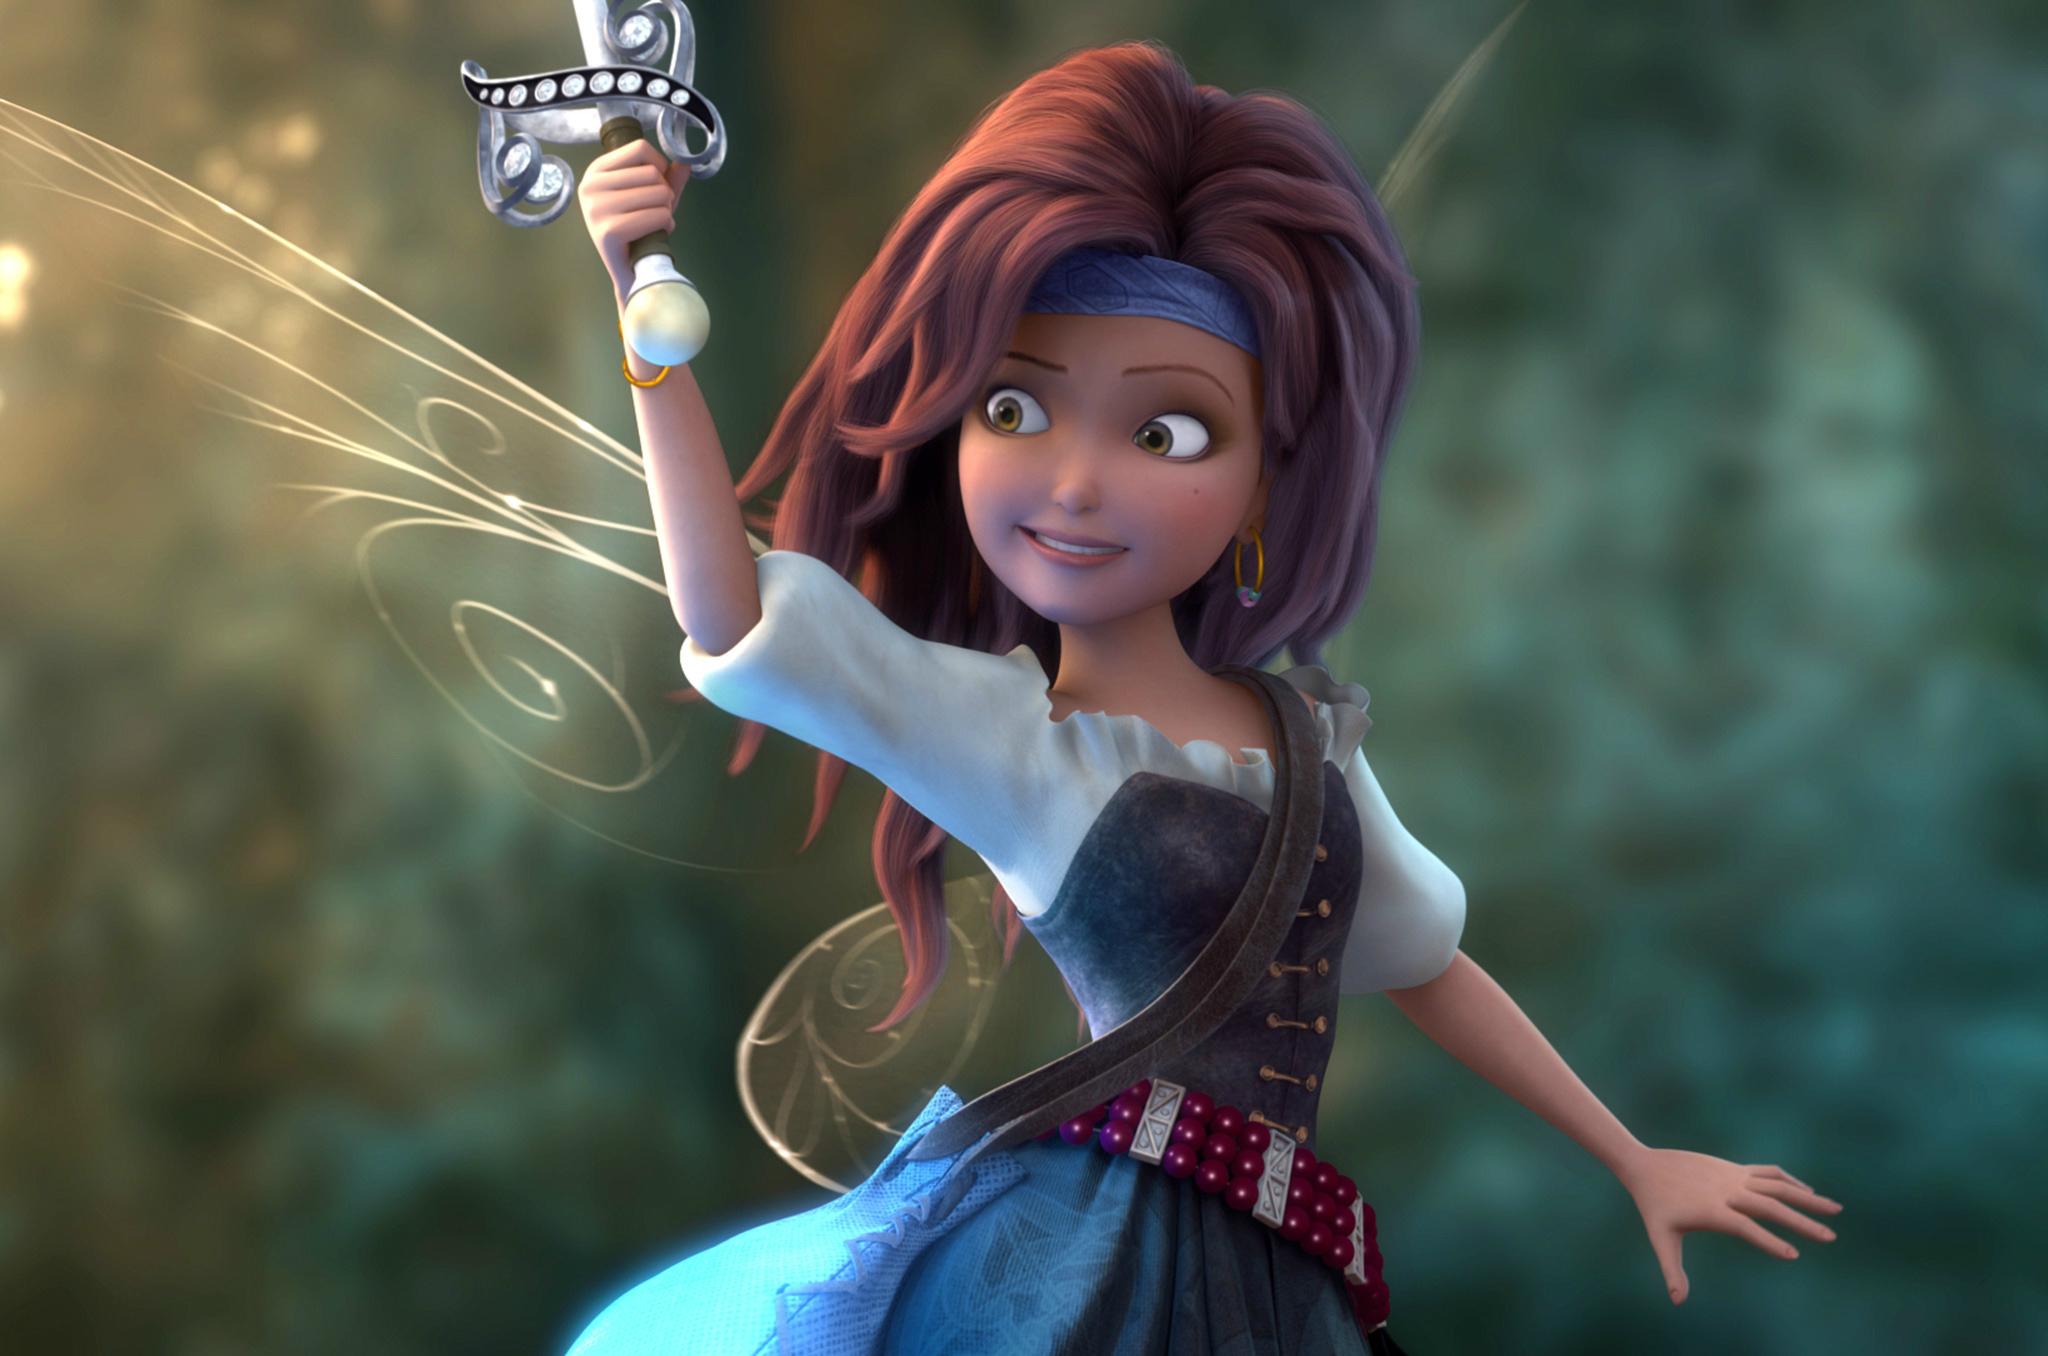 Película animada Tinker bell: hadas y piratas